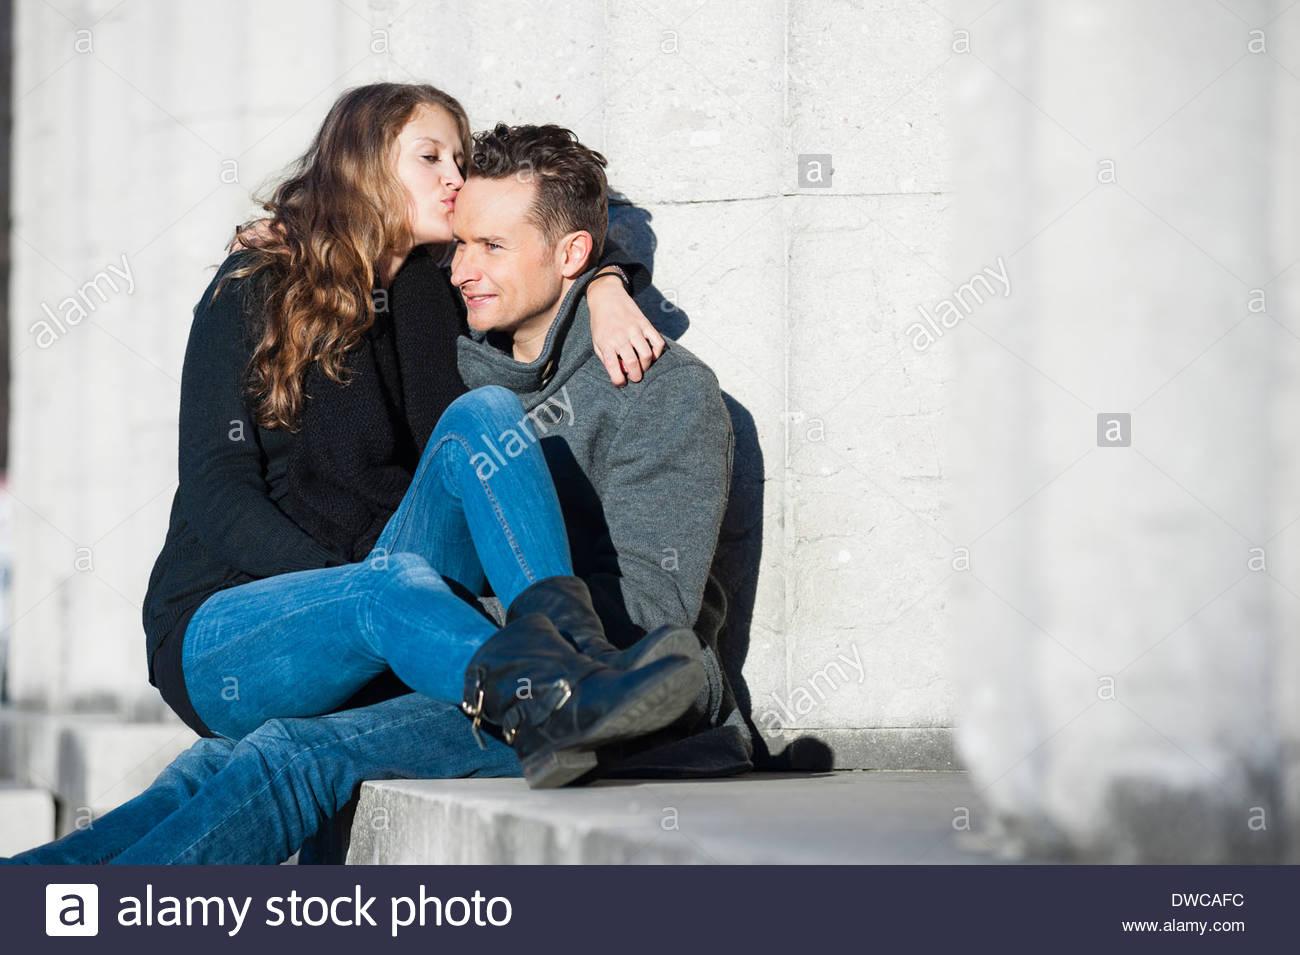 Portrait of happy couple sitting on step - Stock Image